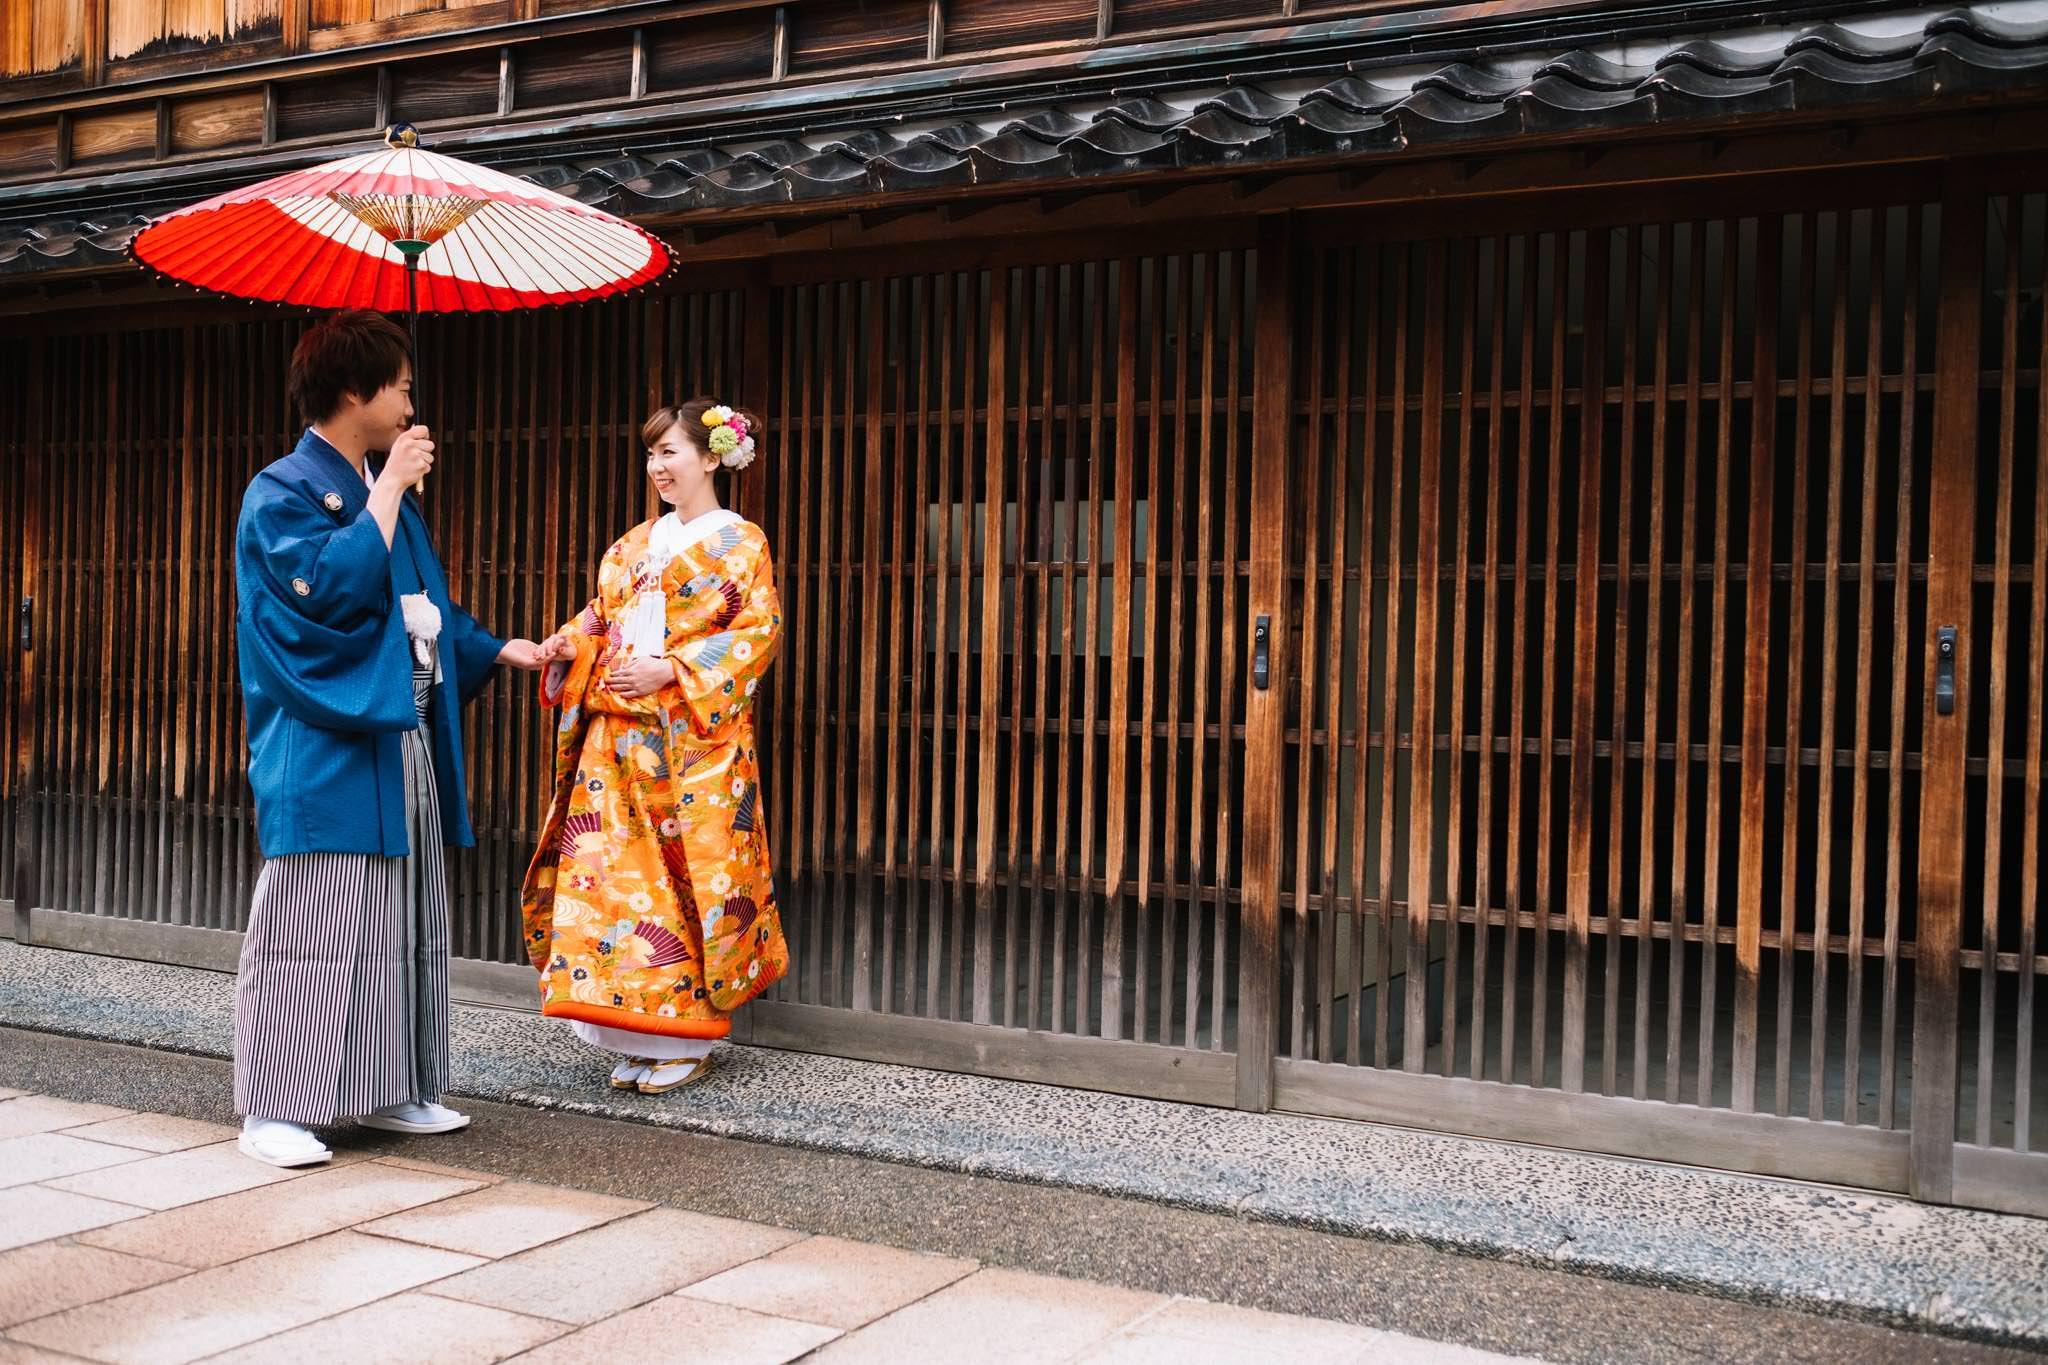 chris_eberhardt_japan_travel_reise_nippon-38.jpg